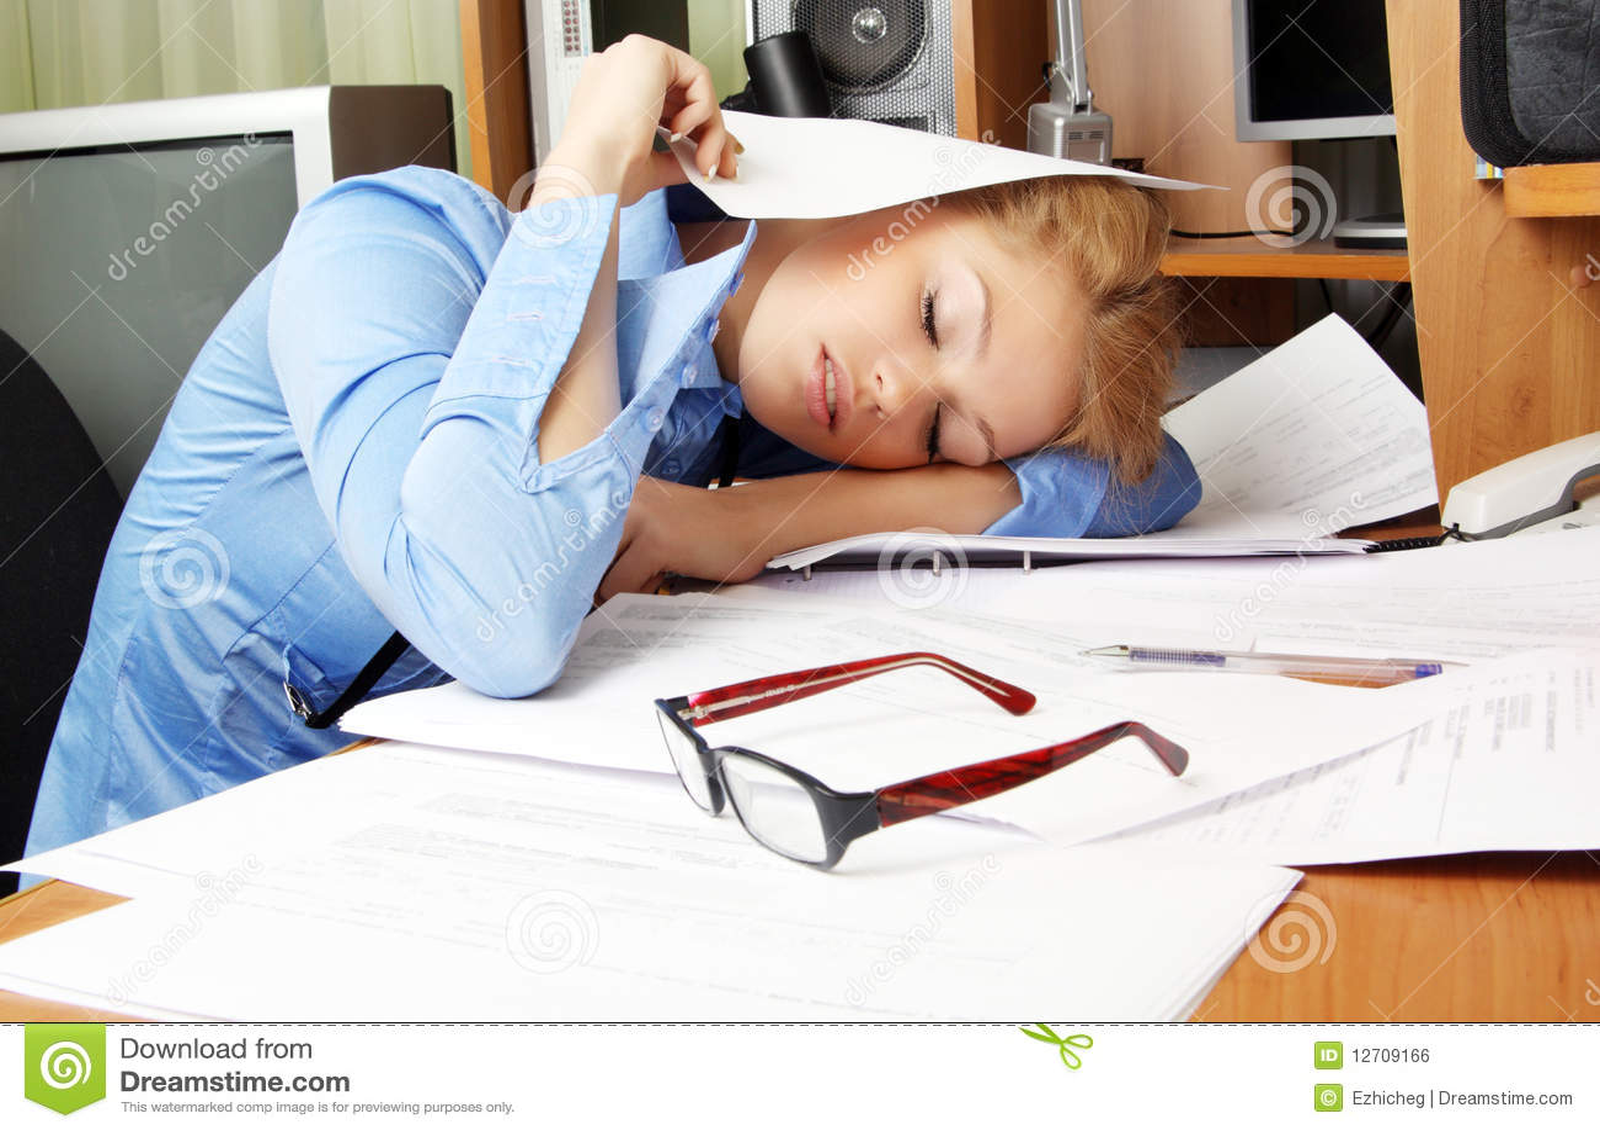 Sleeping on the job royalty free stock image image 12709166